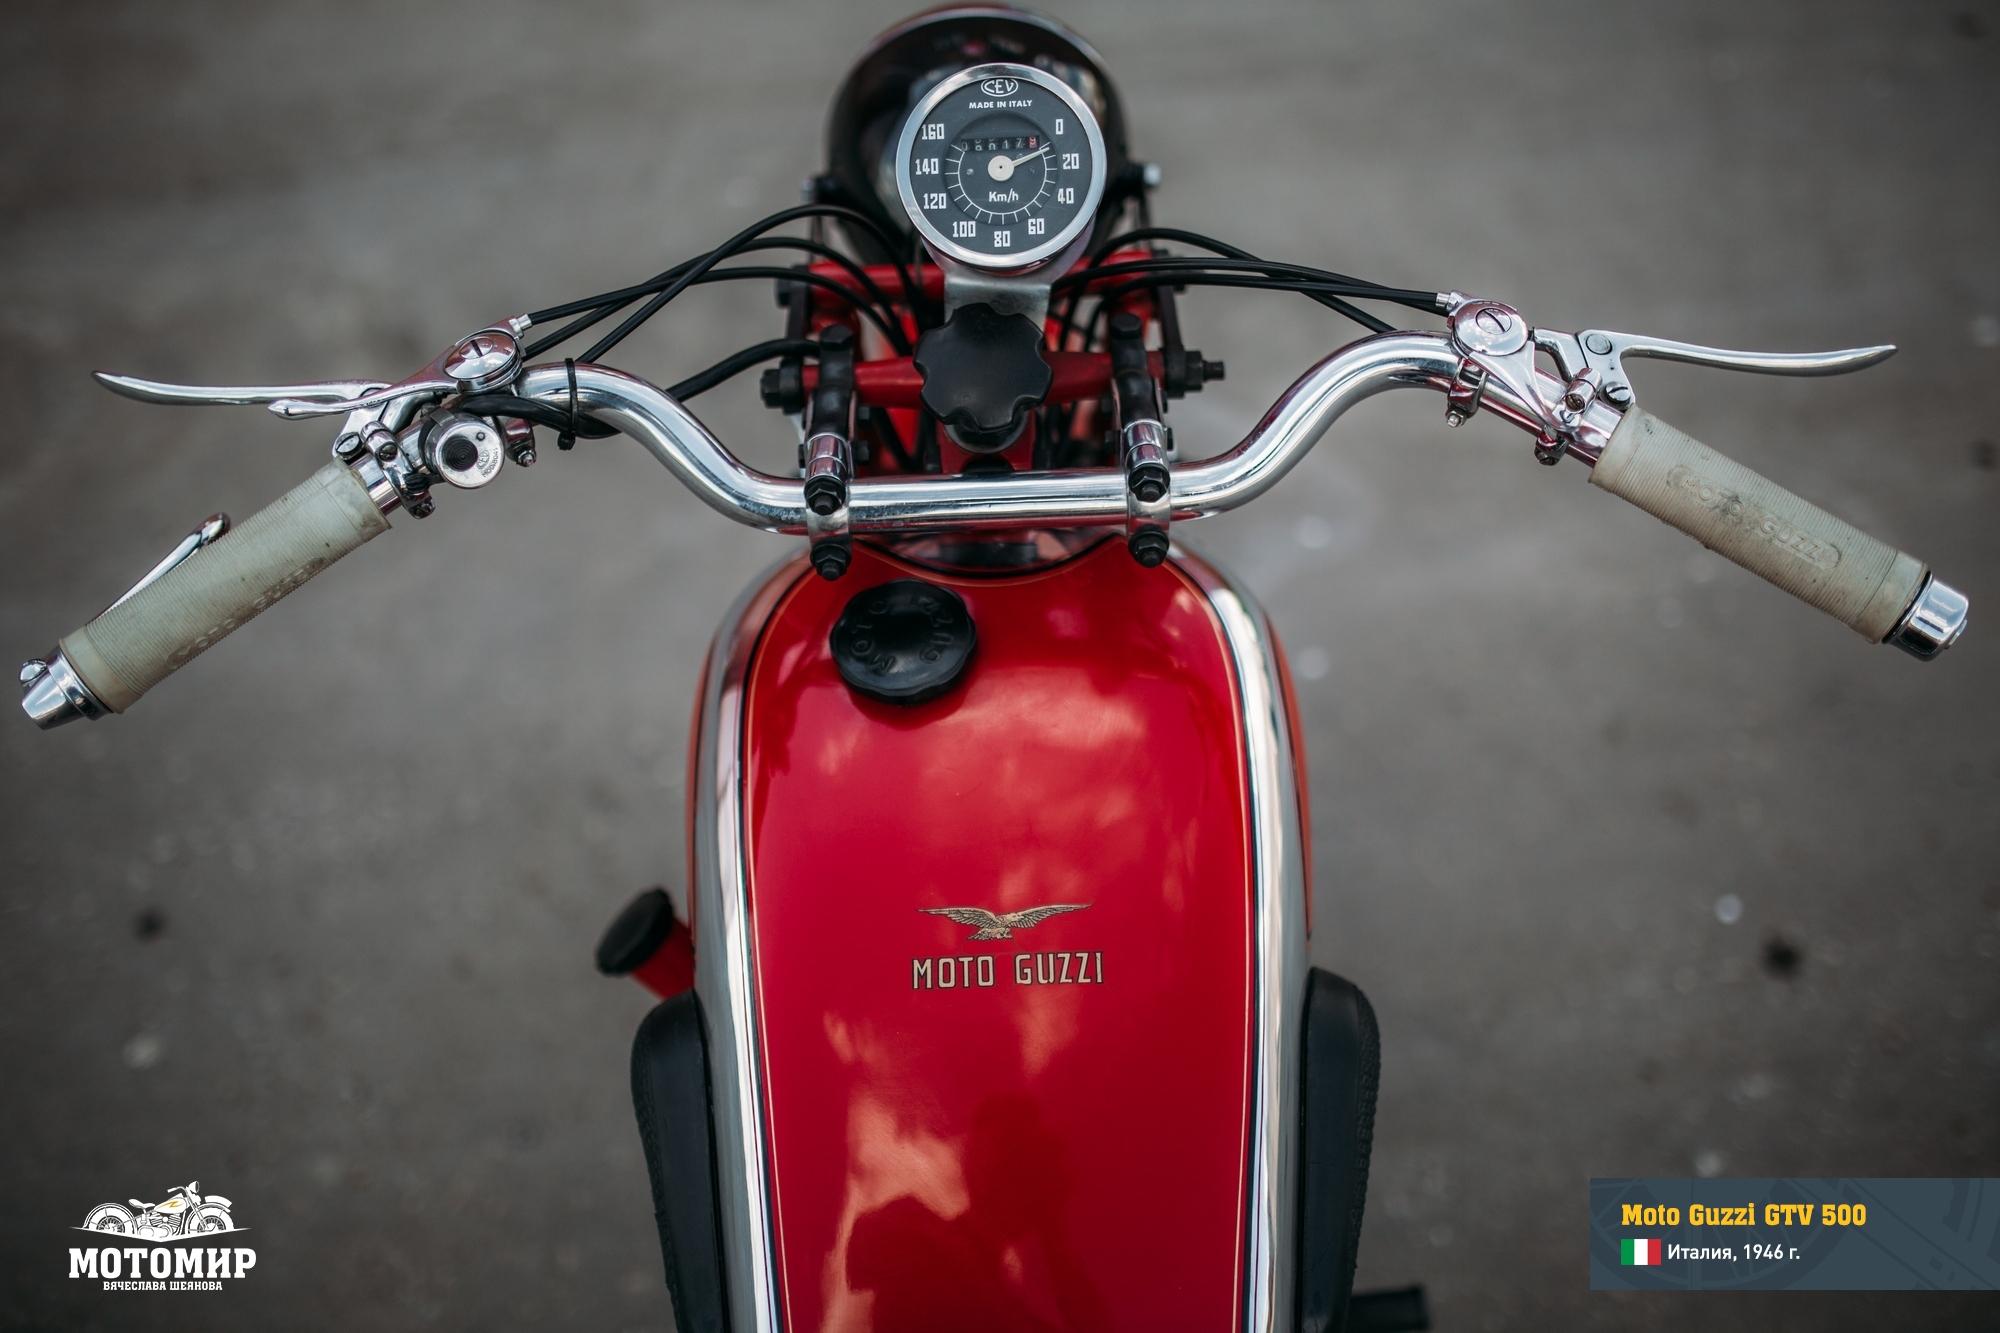 moto-guzzi-gtv-500-201509-web-31